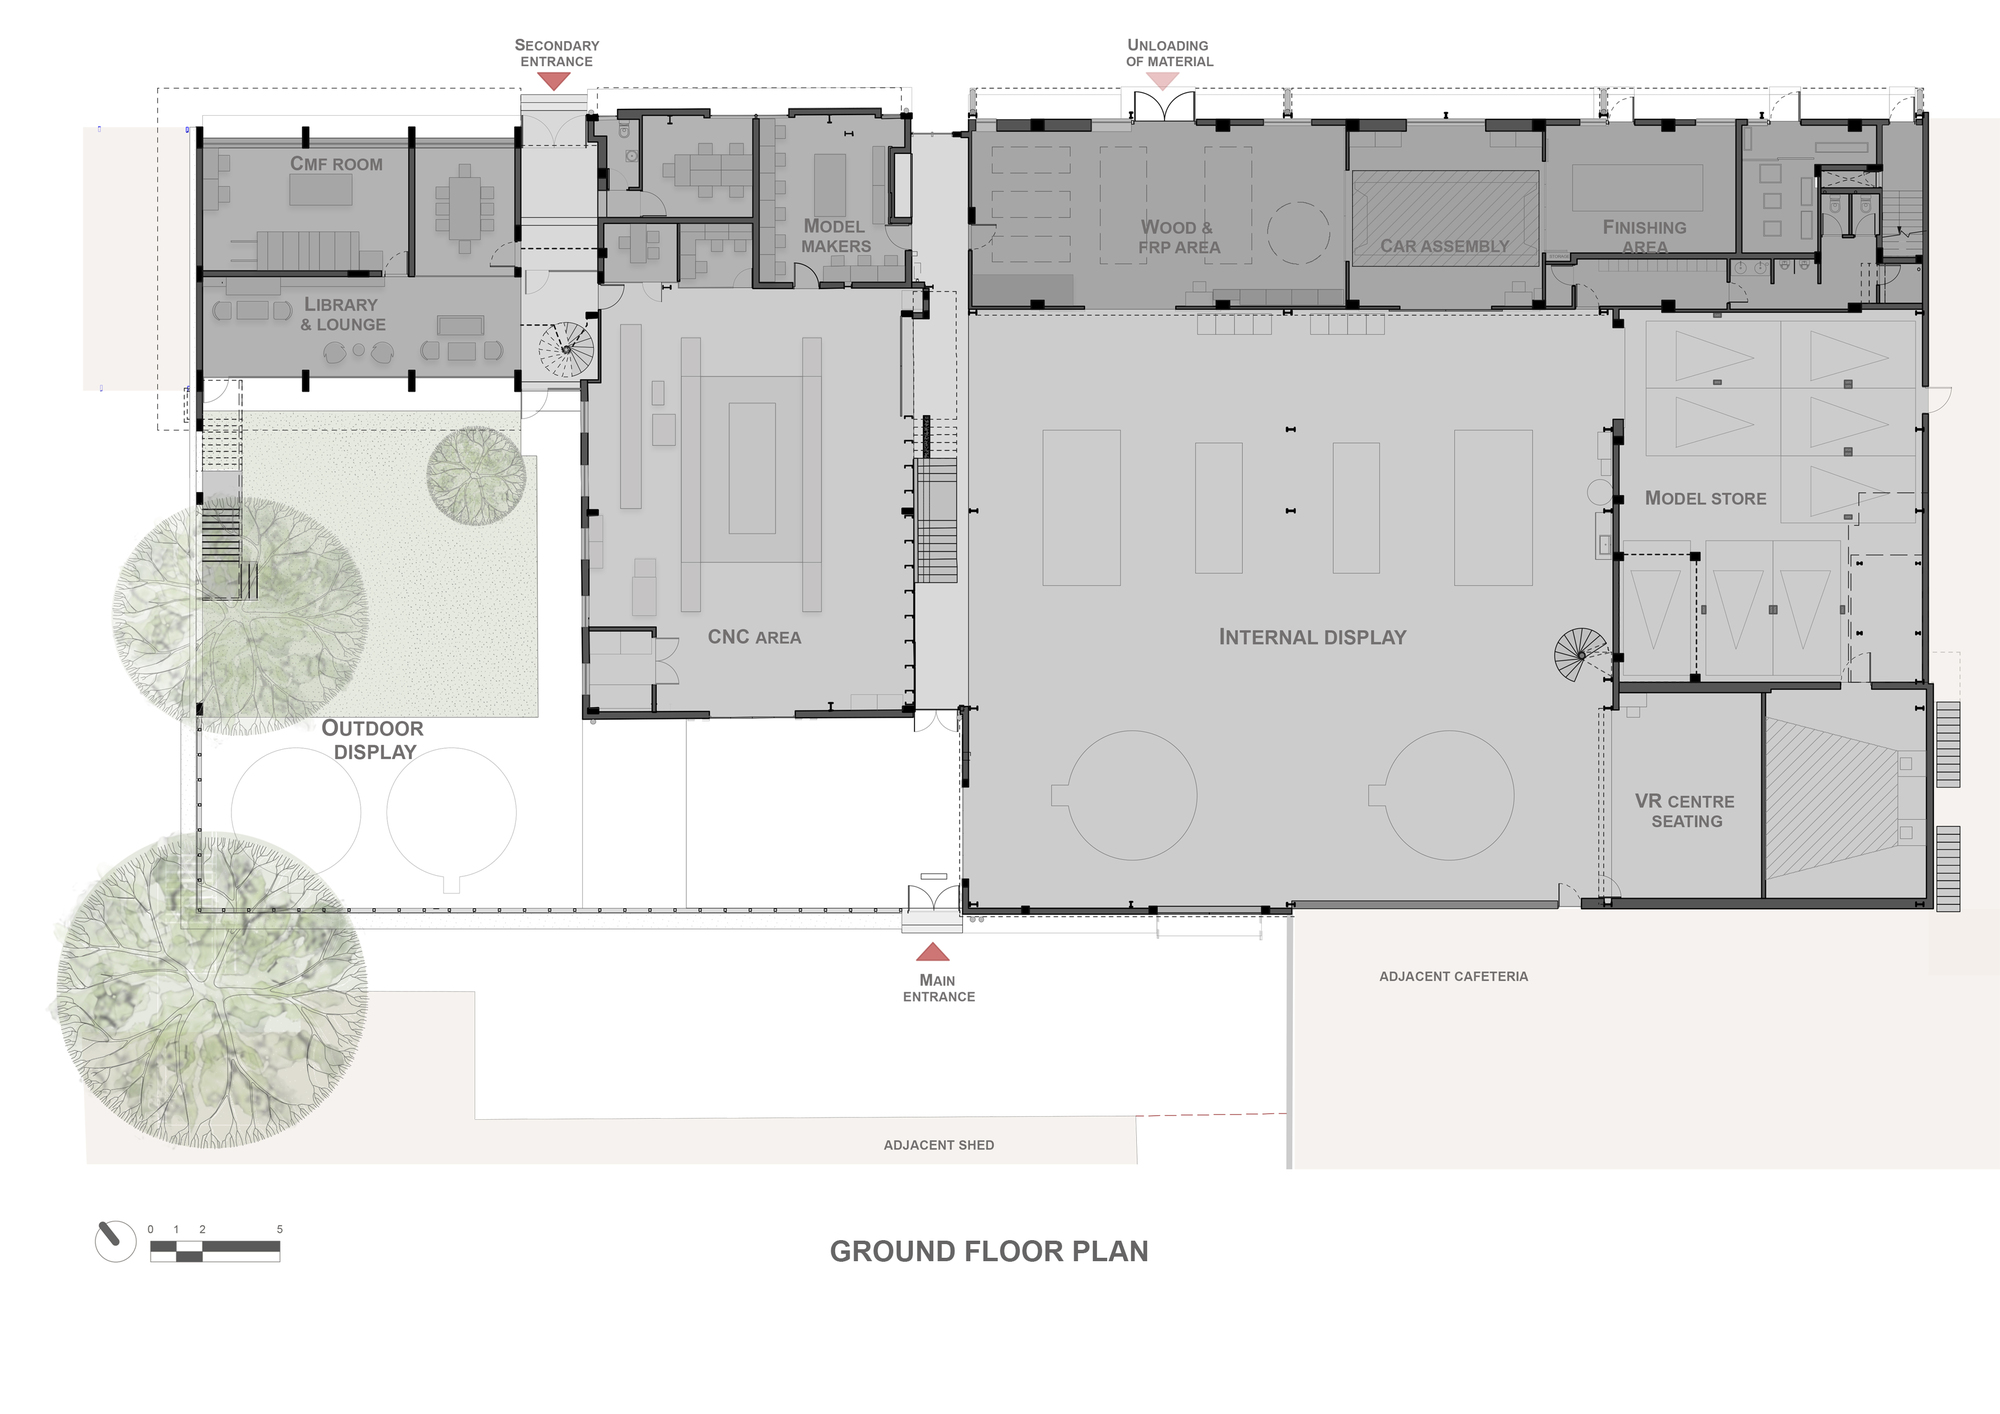 Popular Ground Floor Plan